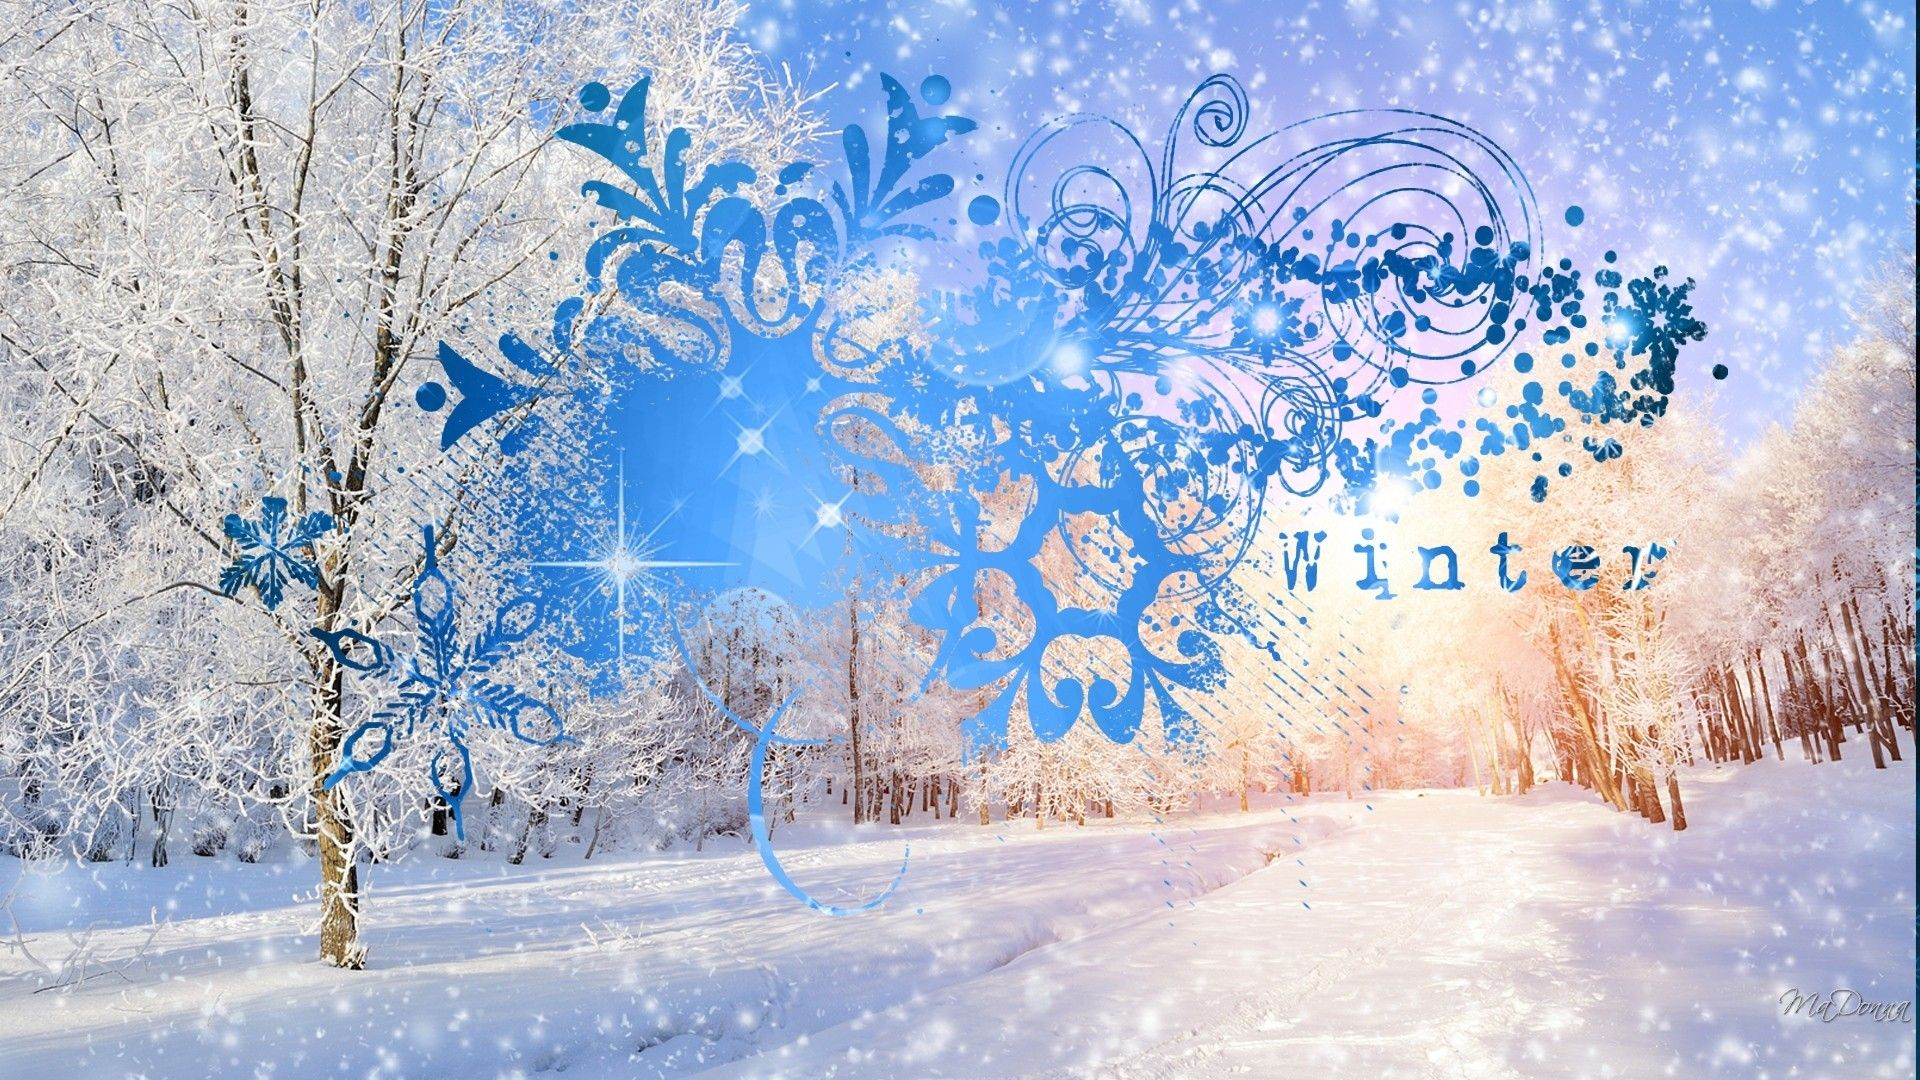 Winter Wonderland Desktop Wallpaper 1920x1080 for 1080p